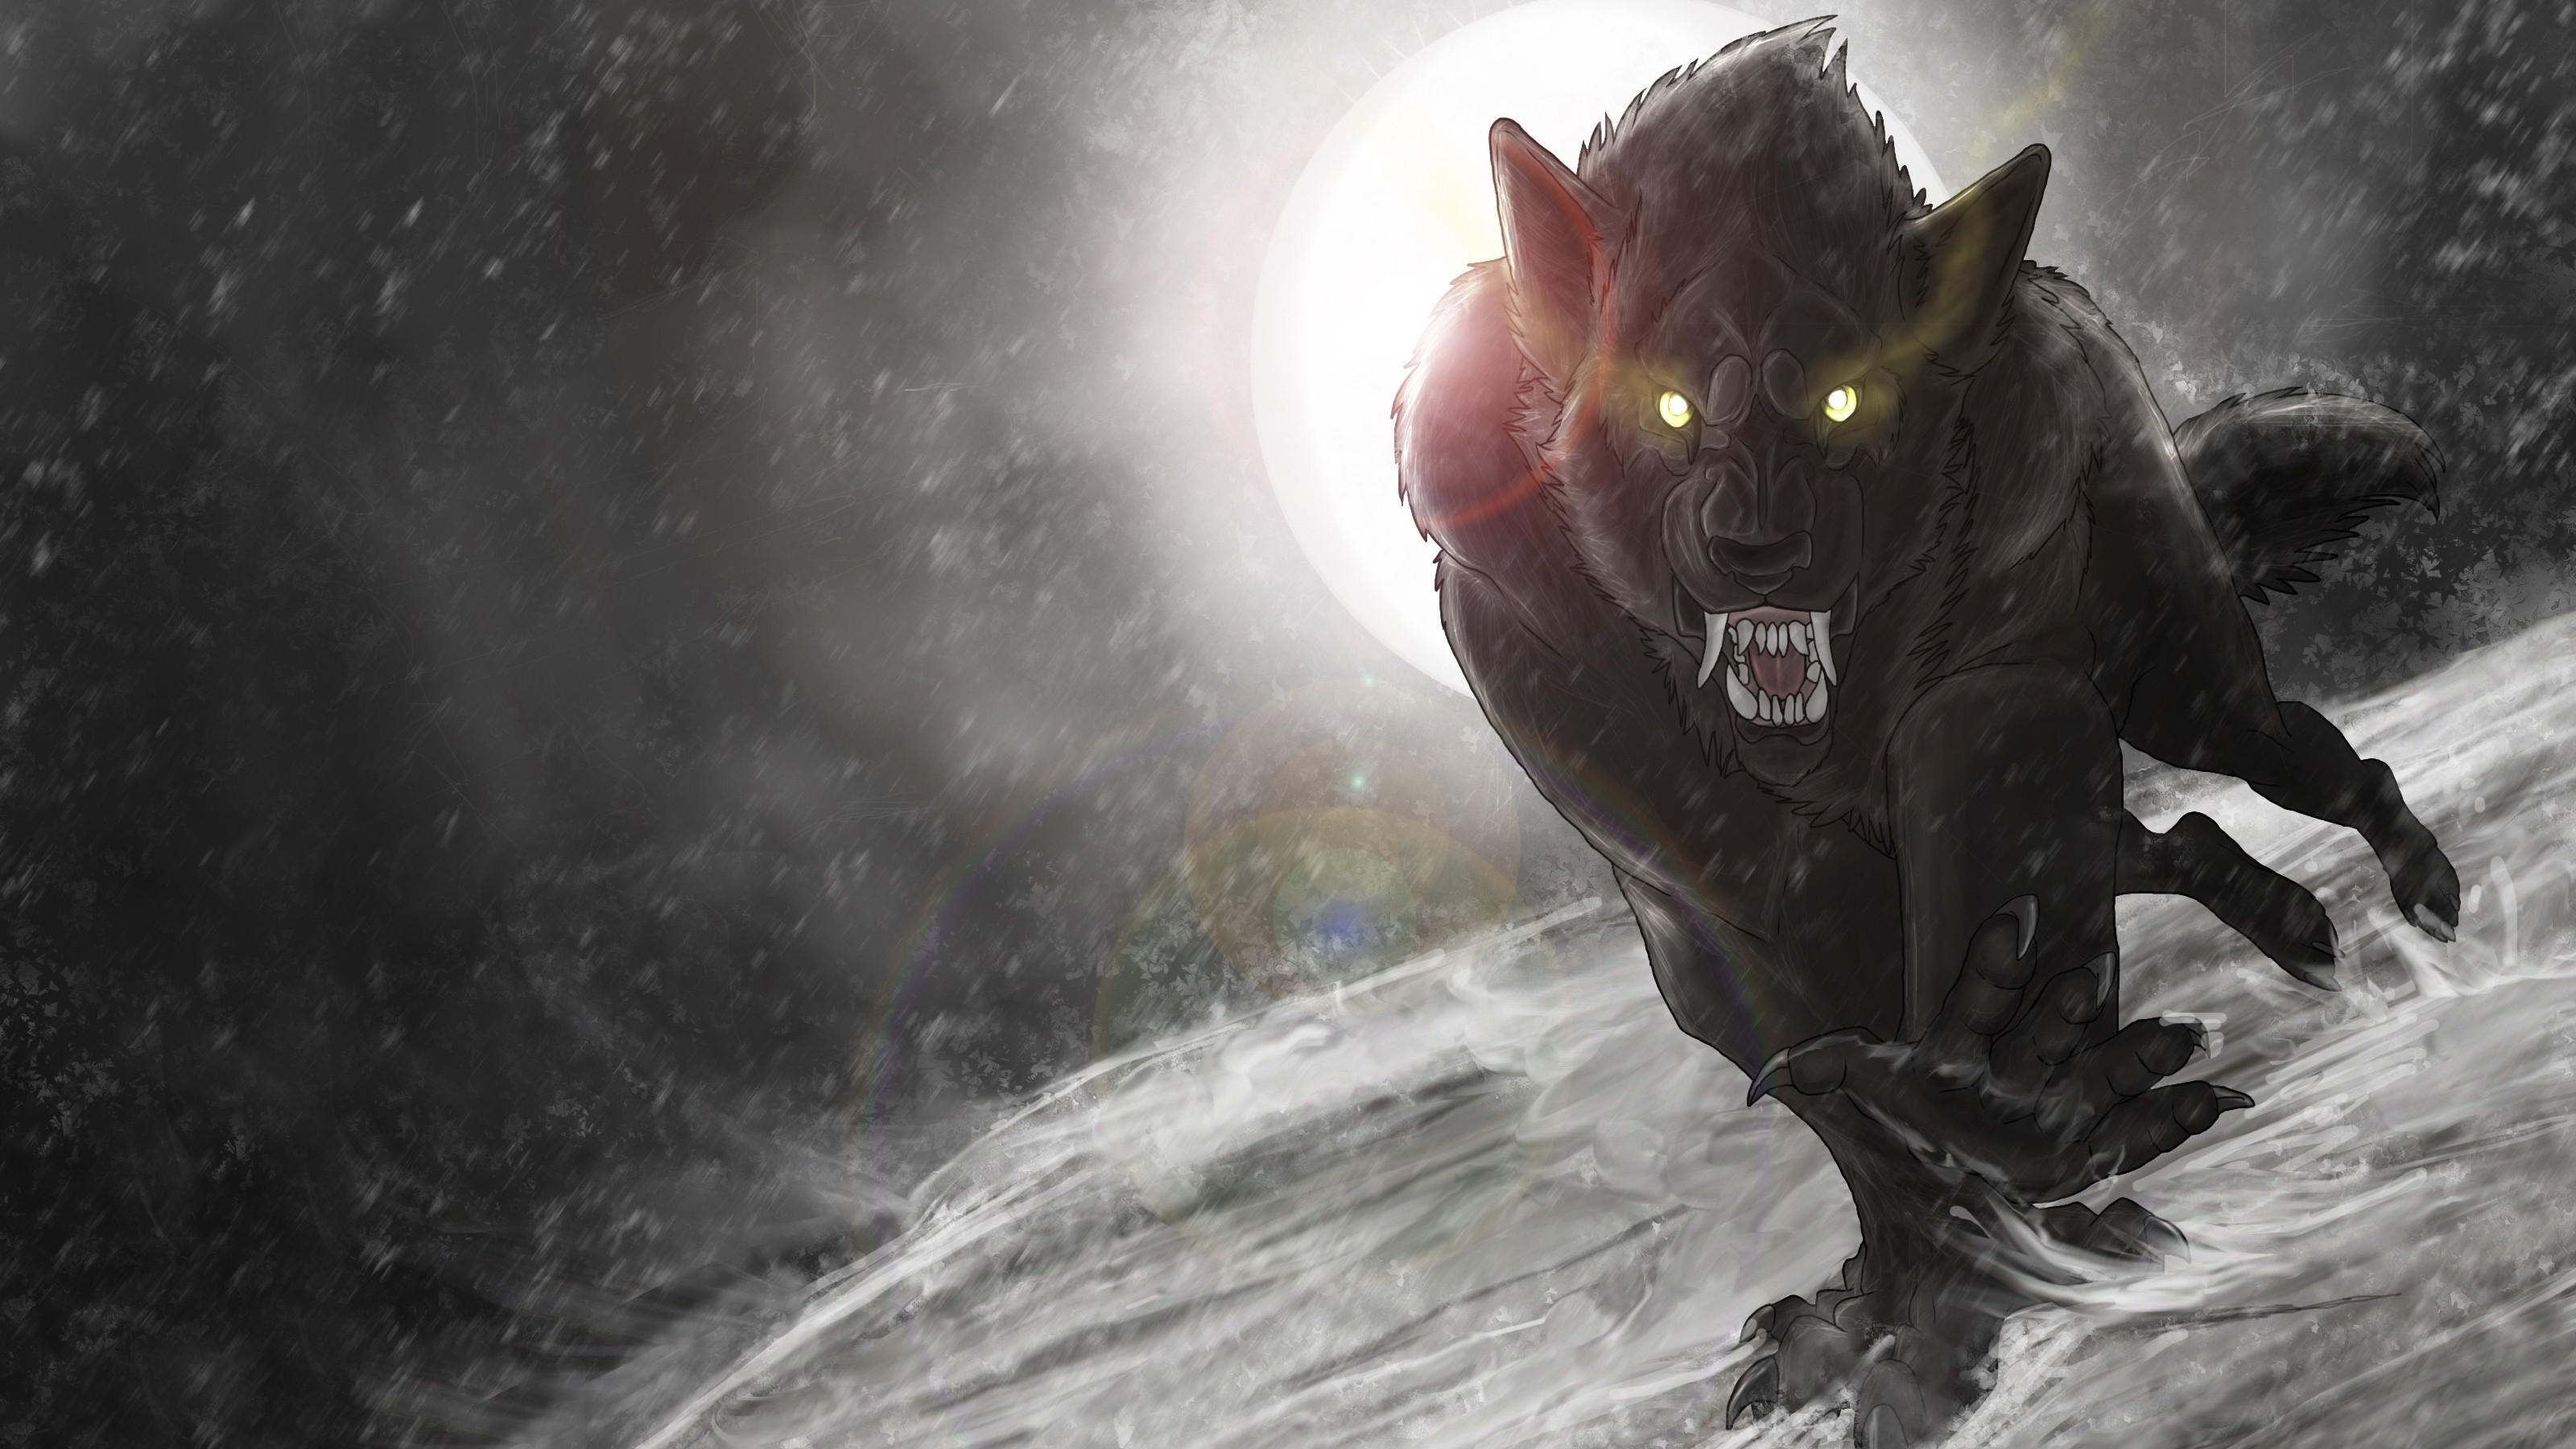 images of werewolves Werewolf HD Wallpaper Background For